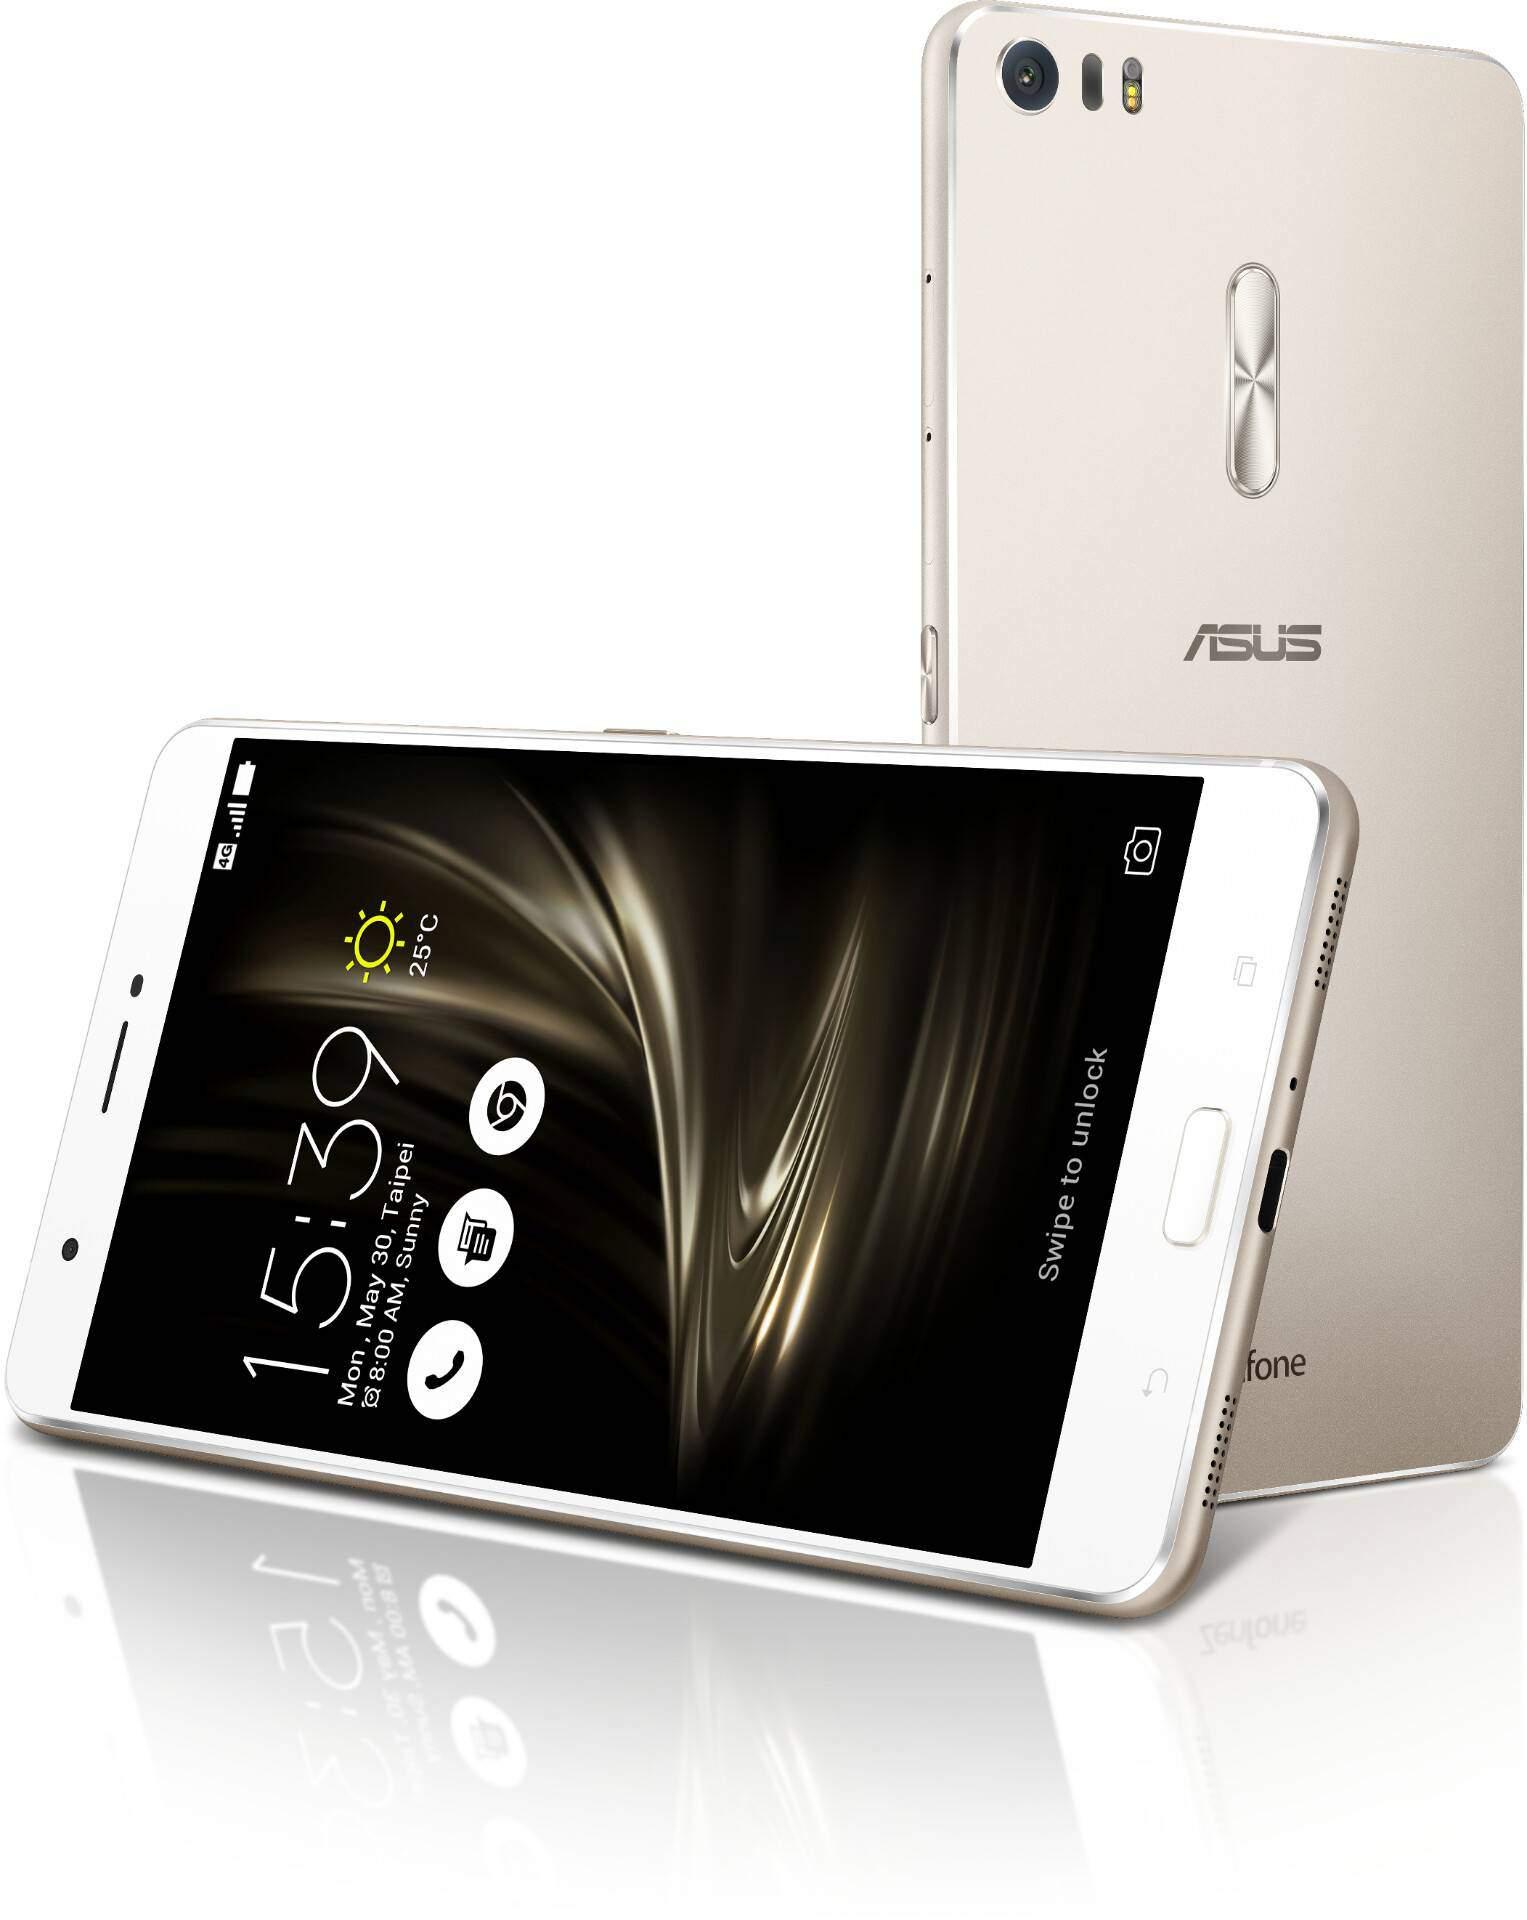 ASUS ZenFone 3 Ultra 5